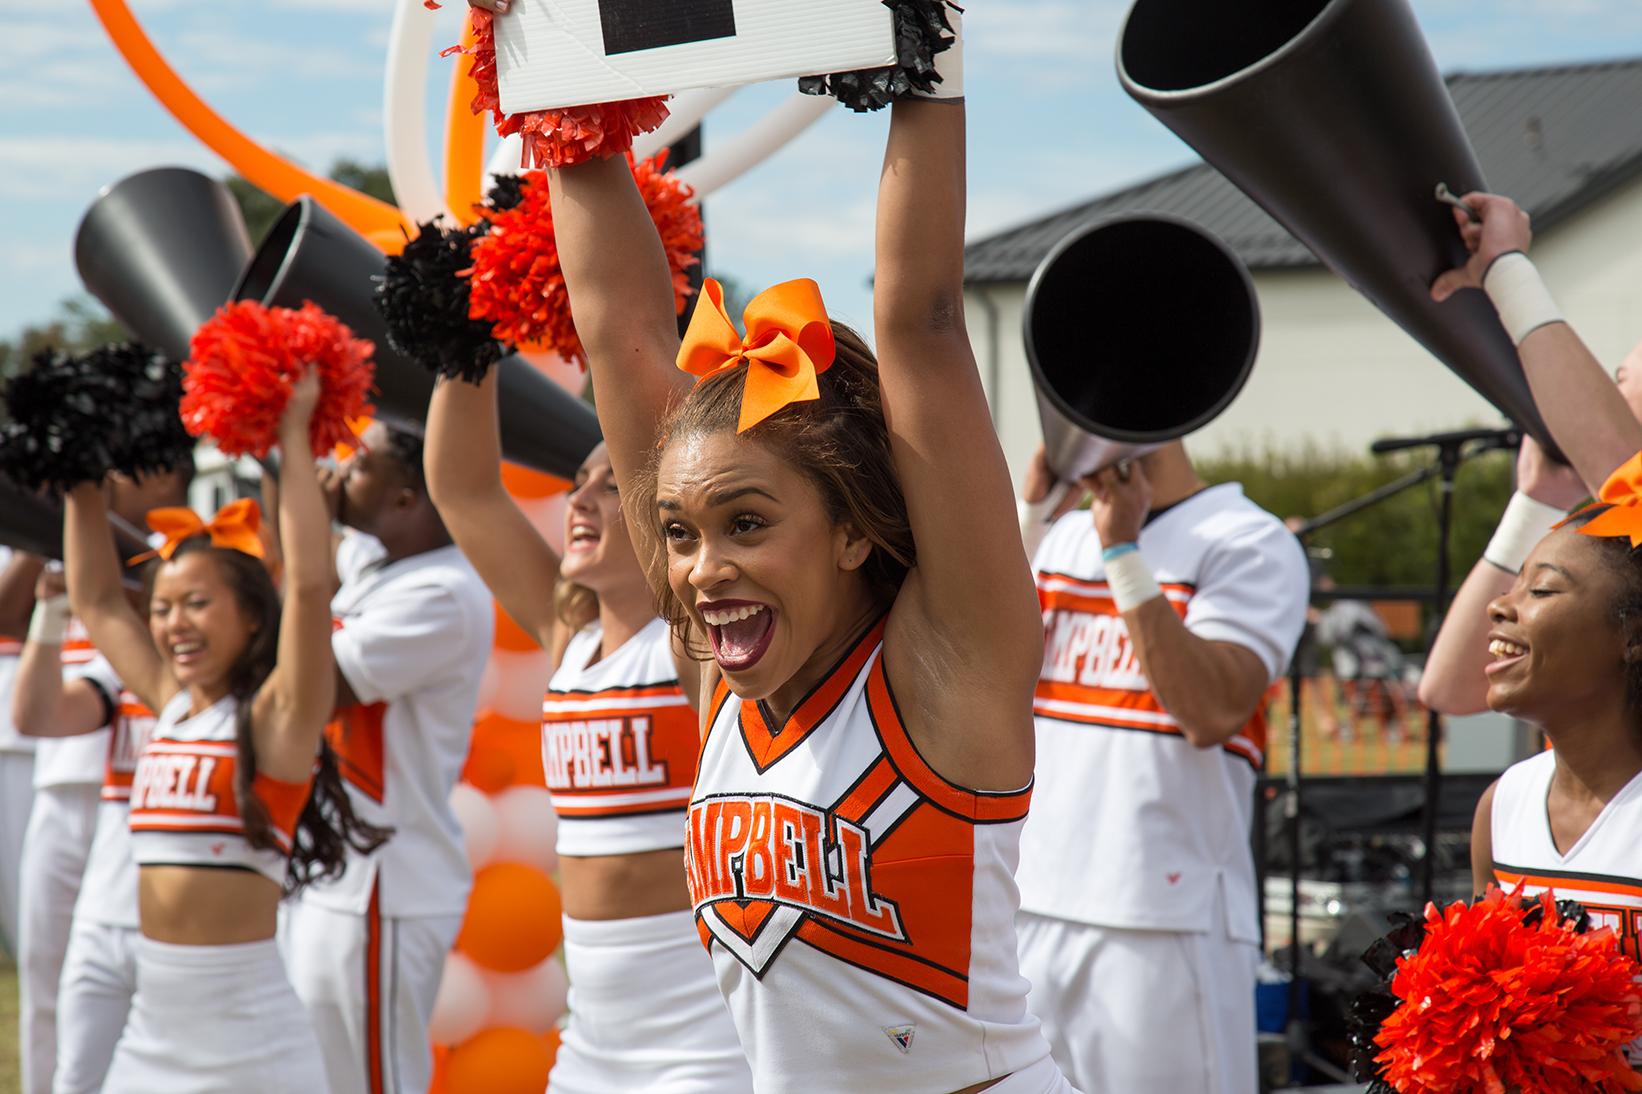 Campbell cheerleaders